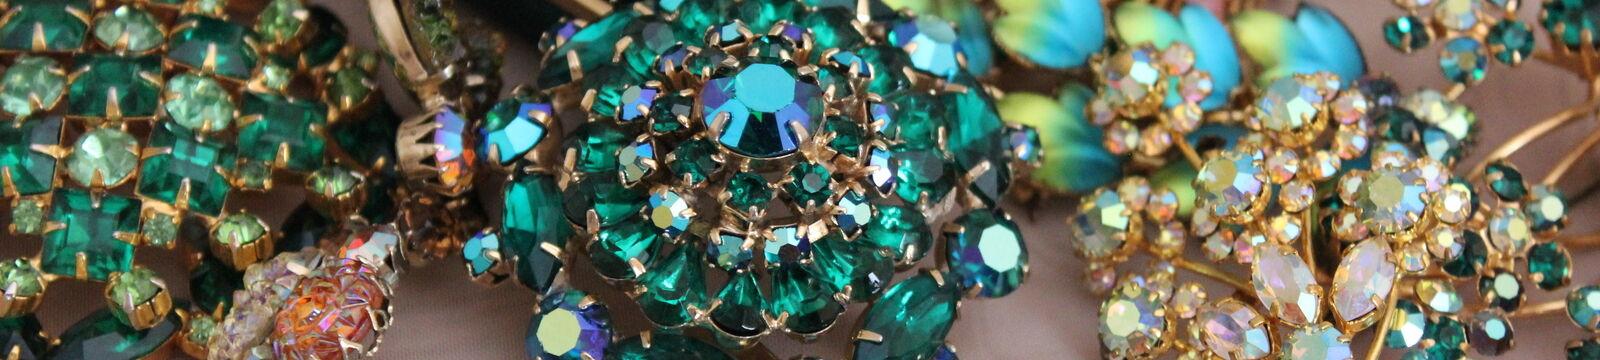 Iren's Vintage Jewelry